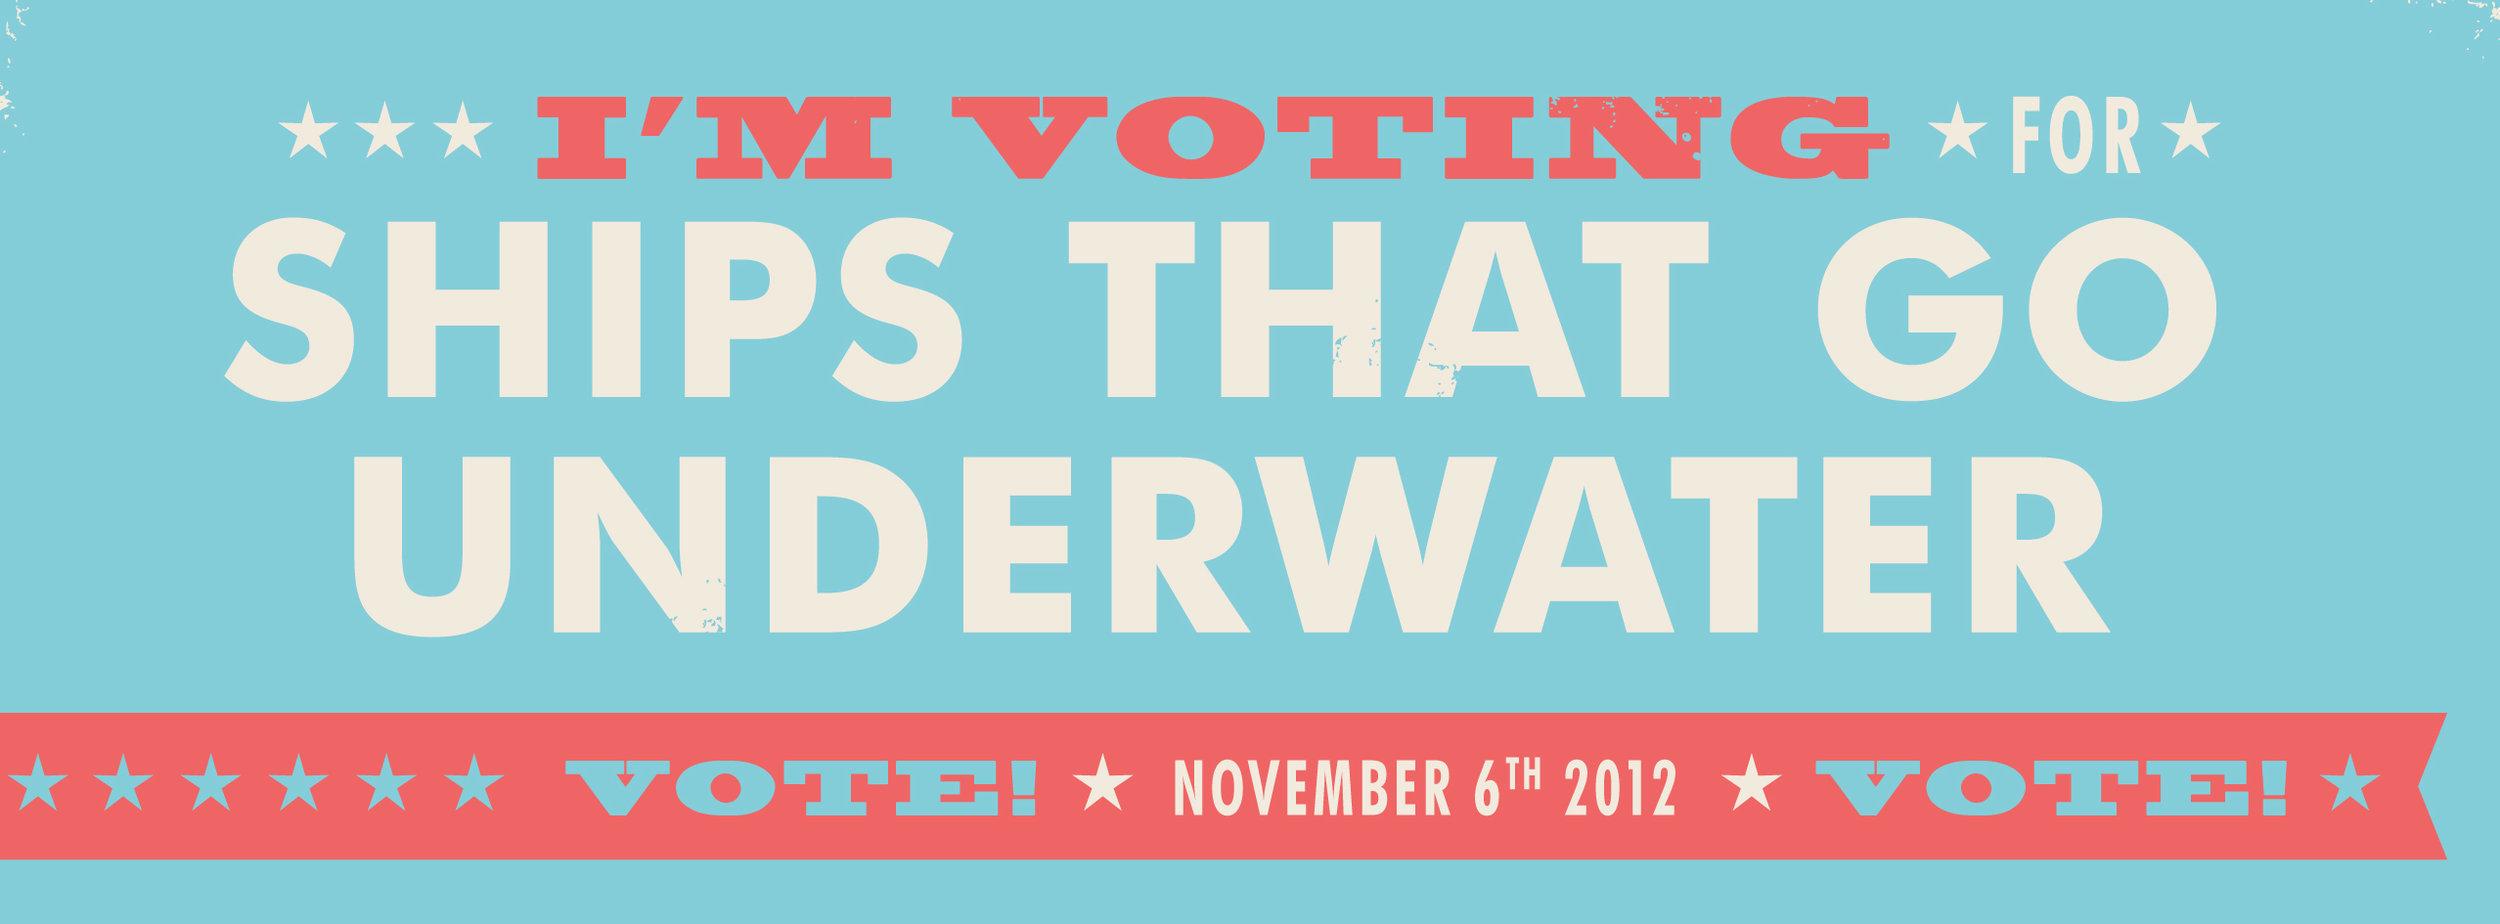 ElectionFB10.jpg